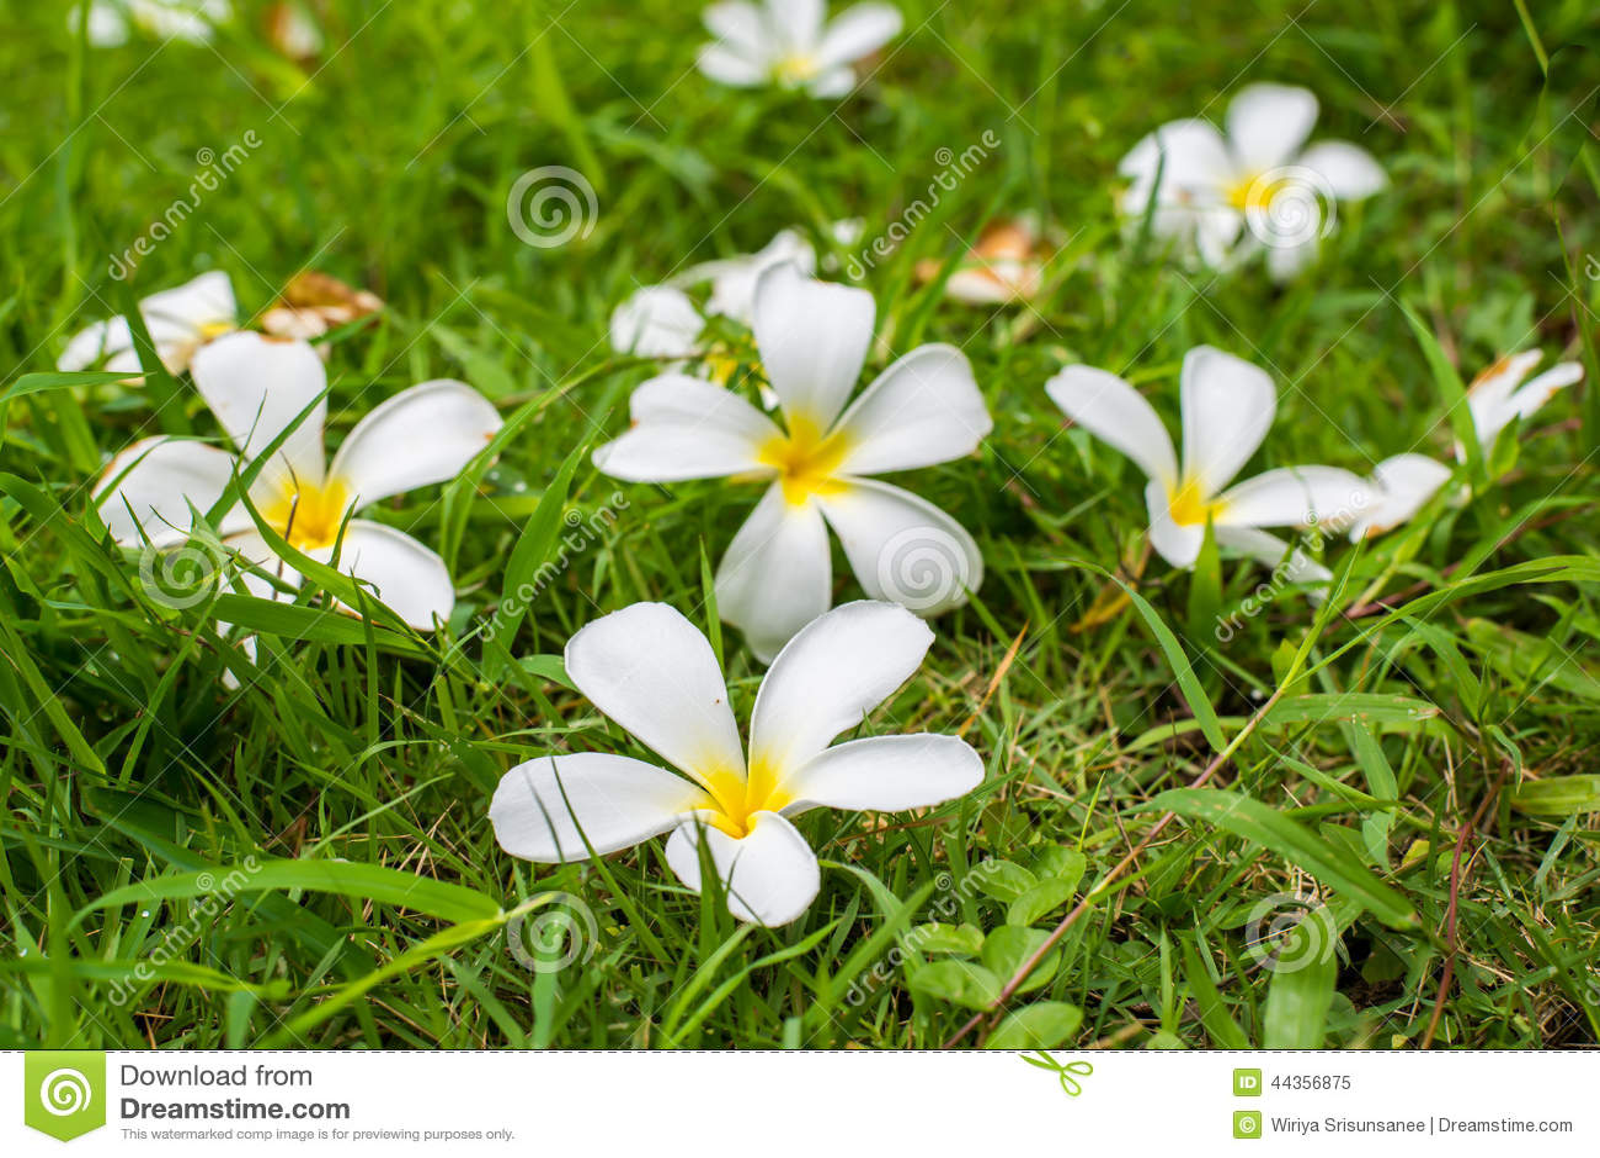 Leelavadee, plumeria, fiore tropicale su erba